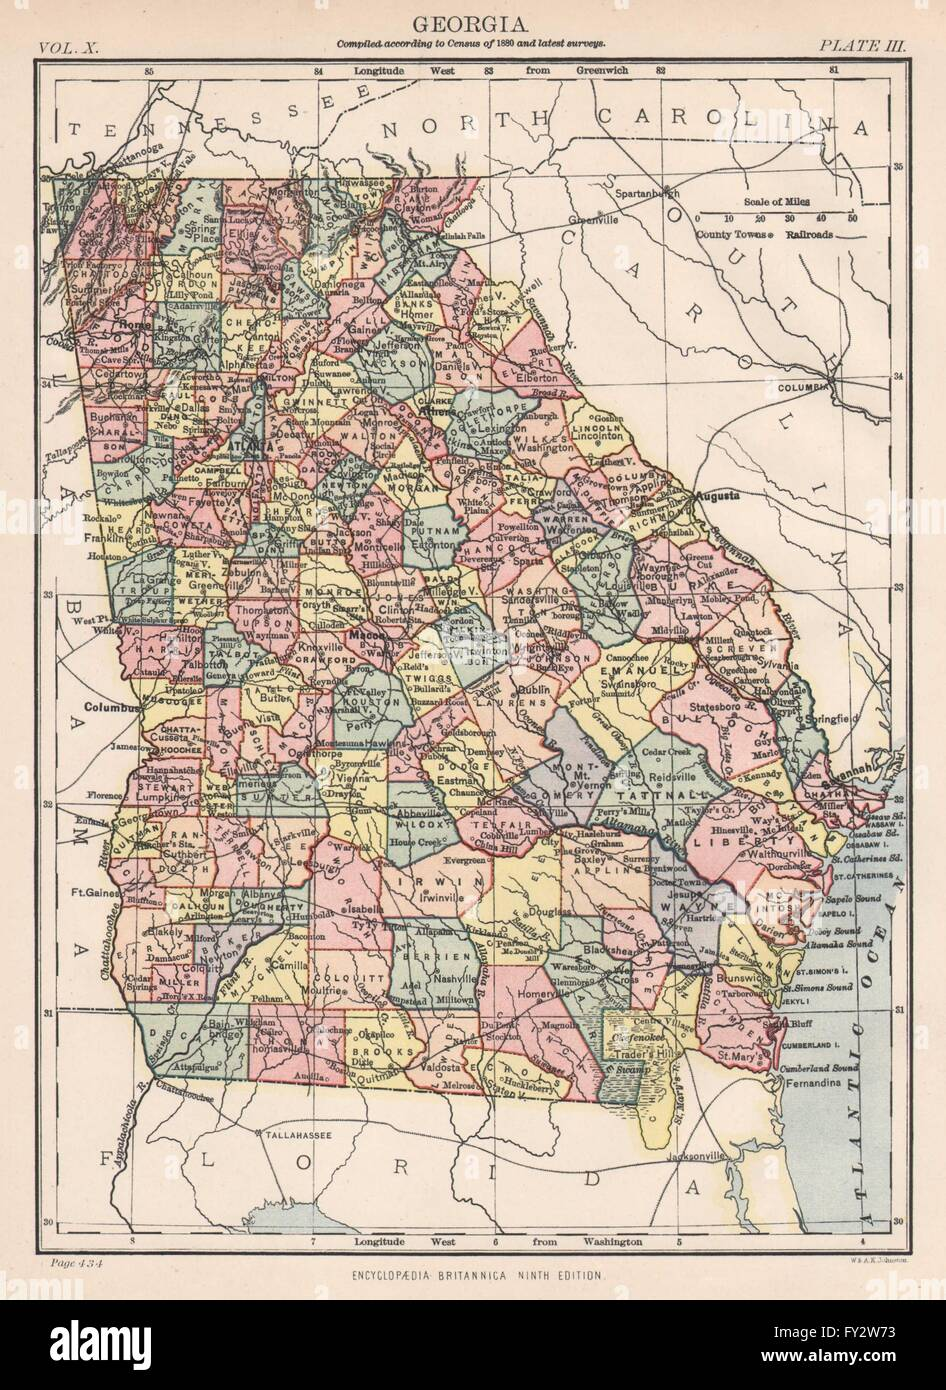 GEORGIA State Map Countiesrailroads Atlanta Britannica Th - Map of counties in georgia